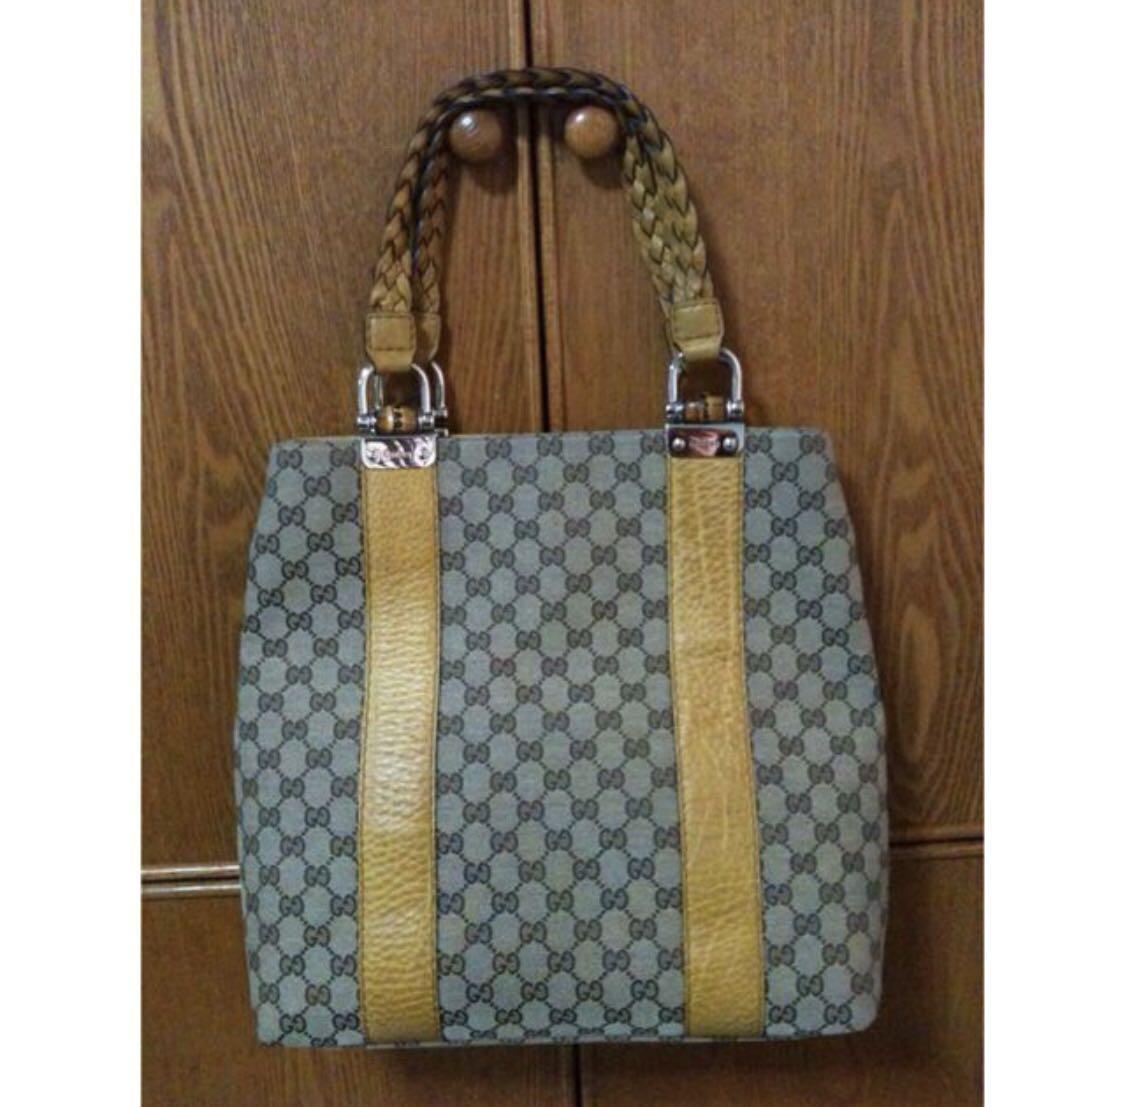 06a244a5e2081d Brand New Gucci Borsa Bag, Luxury, Bags & Wallets, Handbags on Carousell